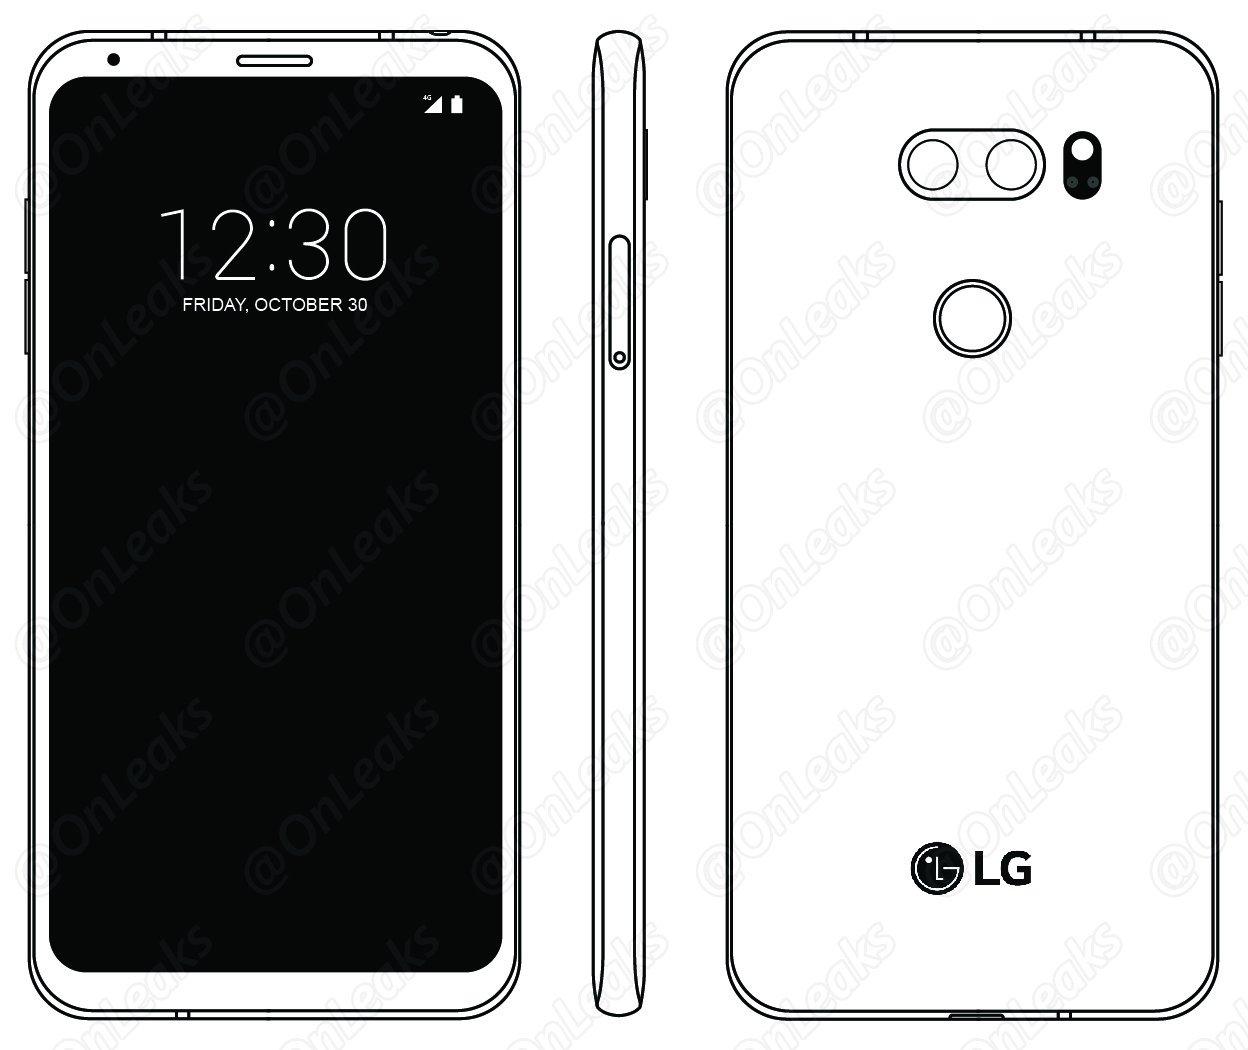 LG V30 camera buna iPhone 8 Note 8